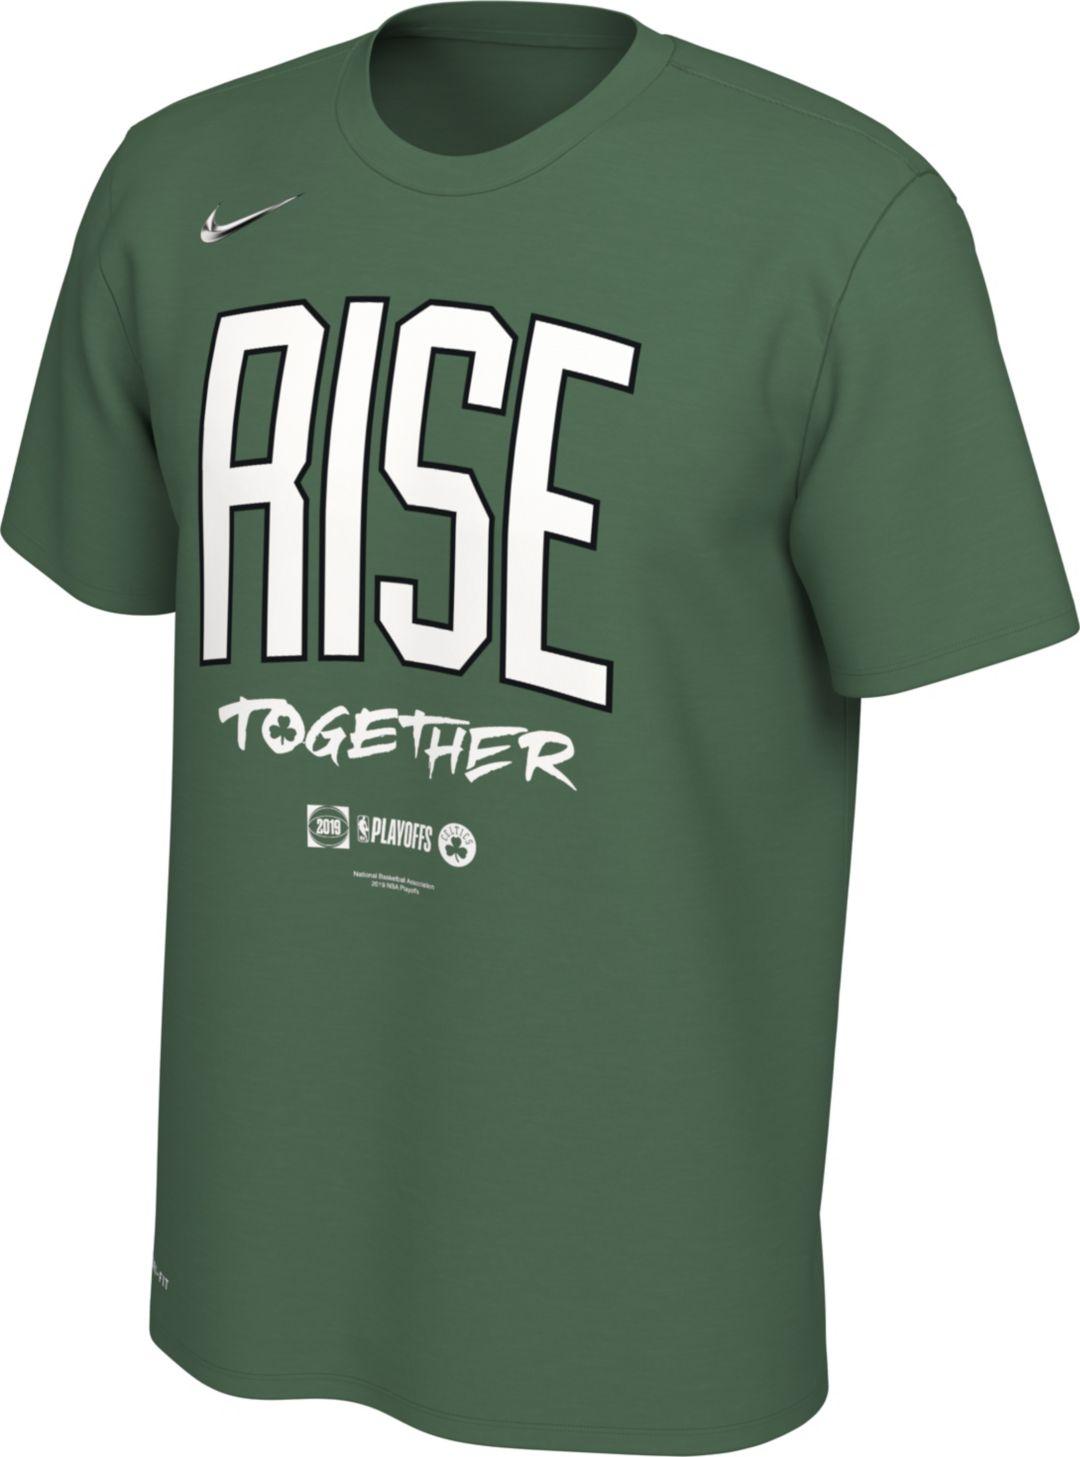 c1d7020e362fc Nike Men's Boston Celtics 2019 Playoffs